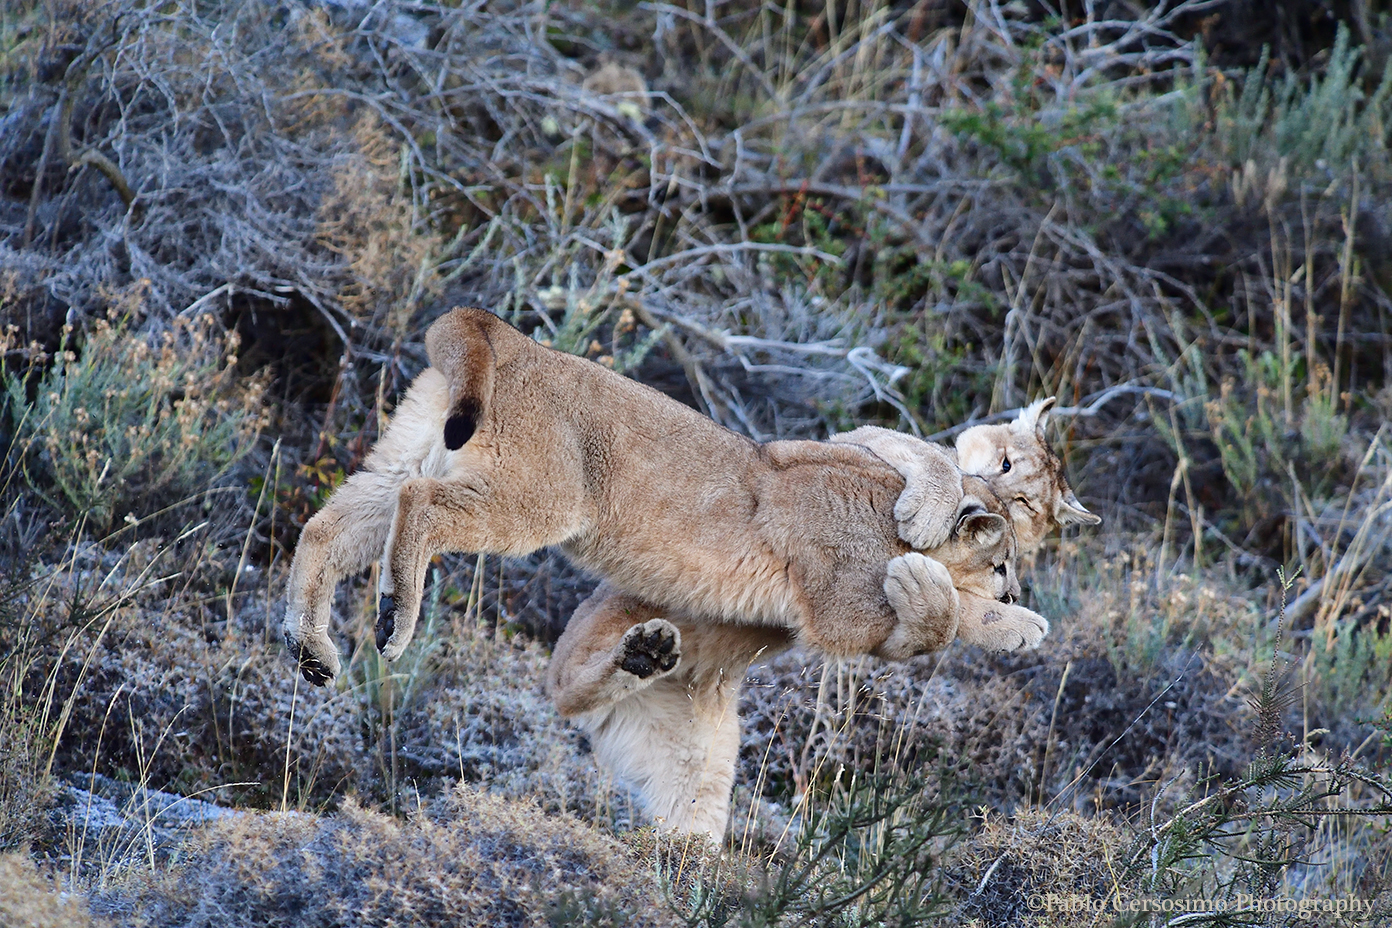 Puma cubs playing